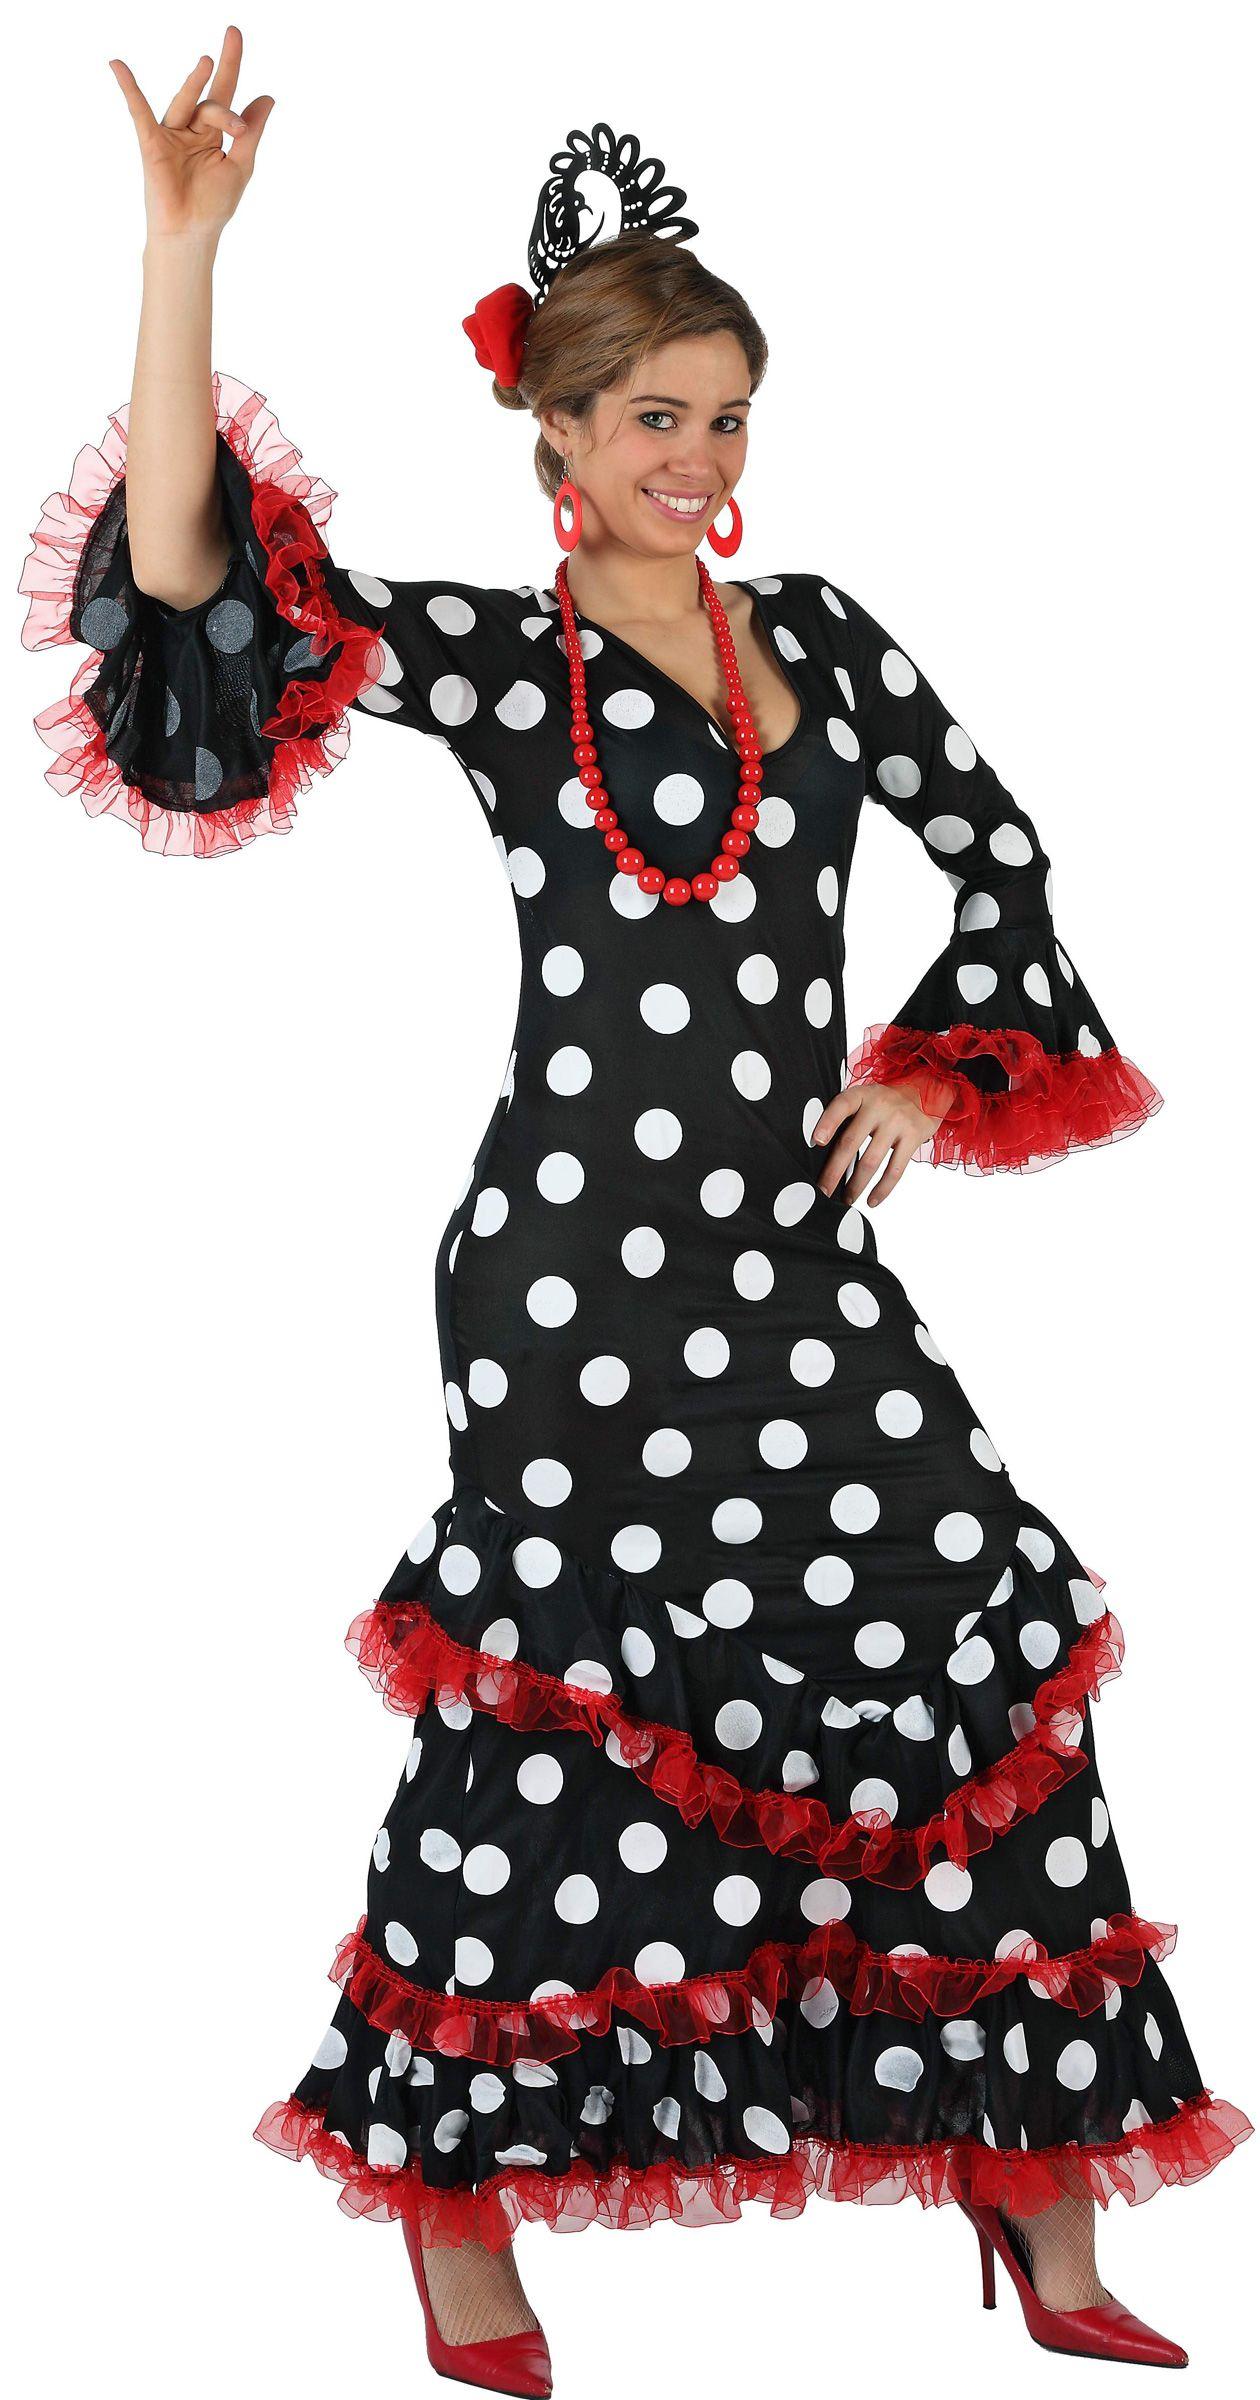 Disfraz de sevillana para mujer Vegaoo, compra de